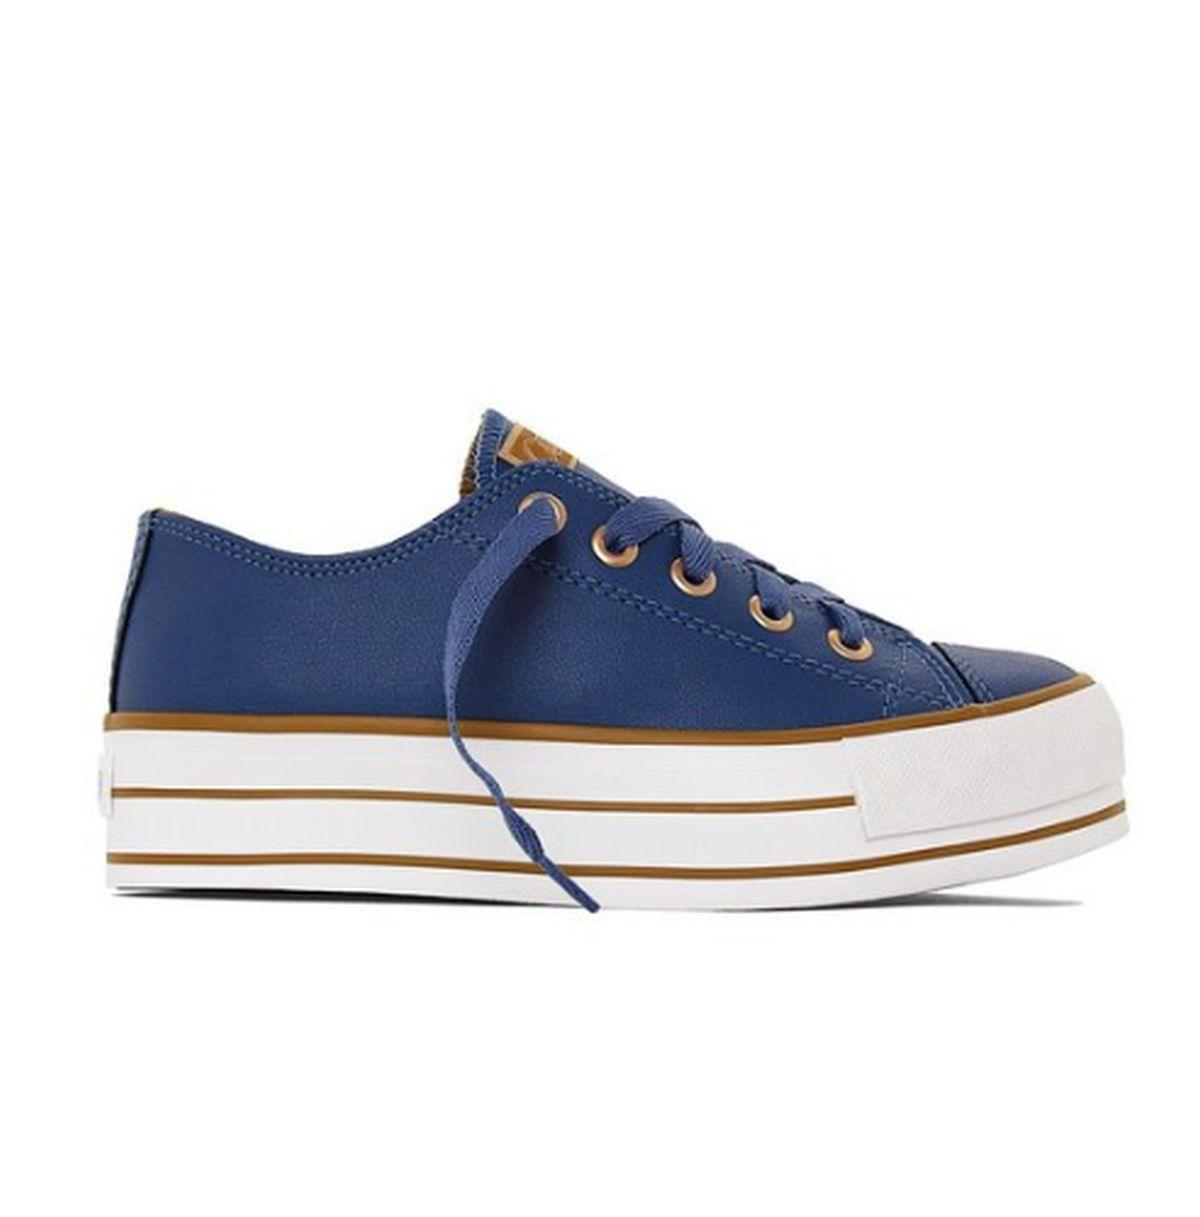 Tênis Feminino Likes Plataform Class Capricho Azul